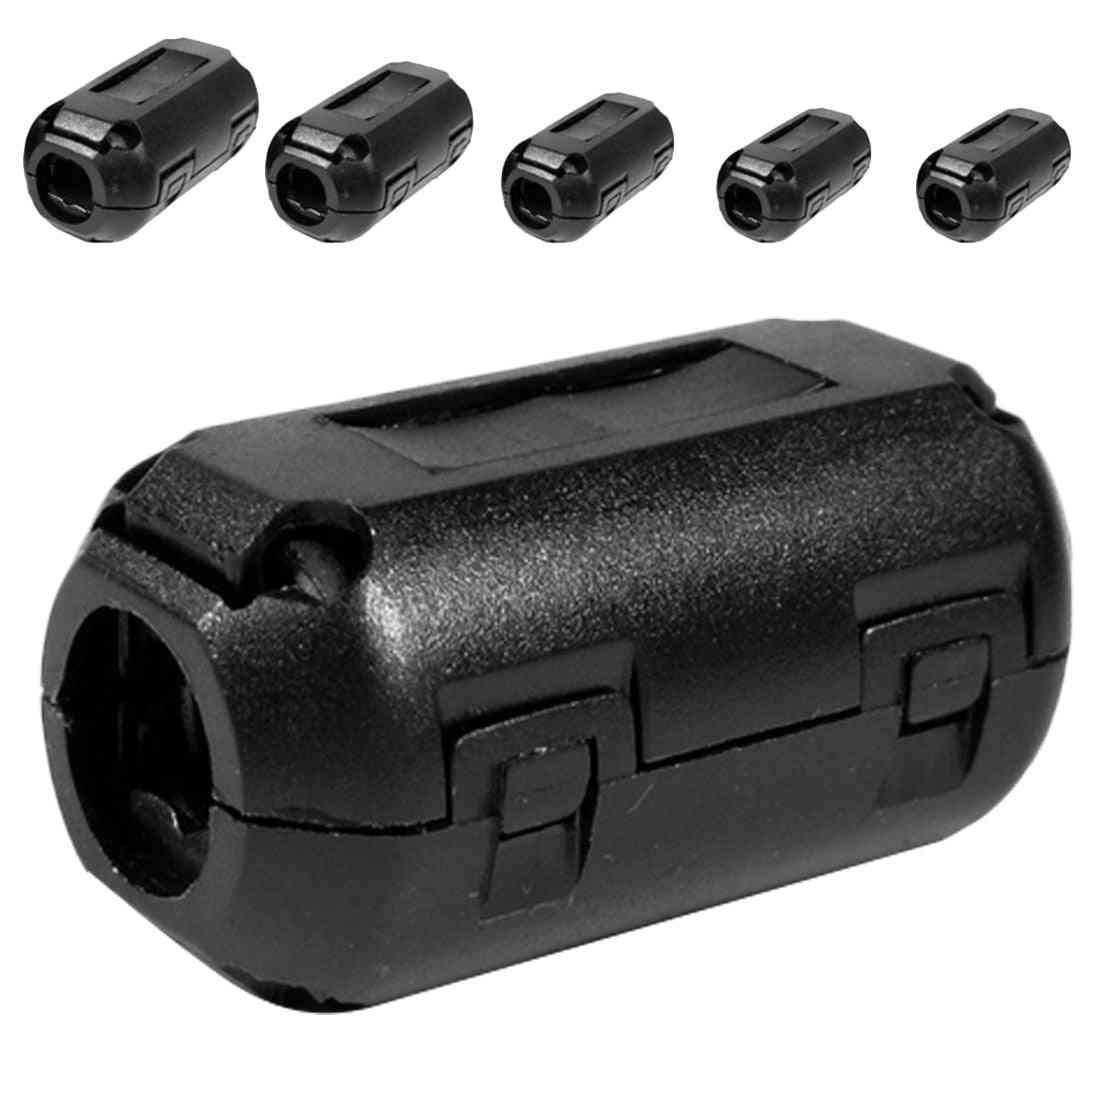 Plastic Clip On Emi Rfi Noise Suppressor